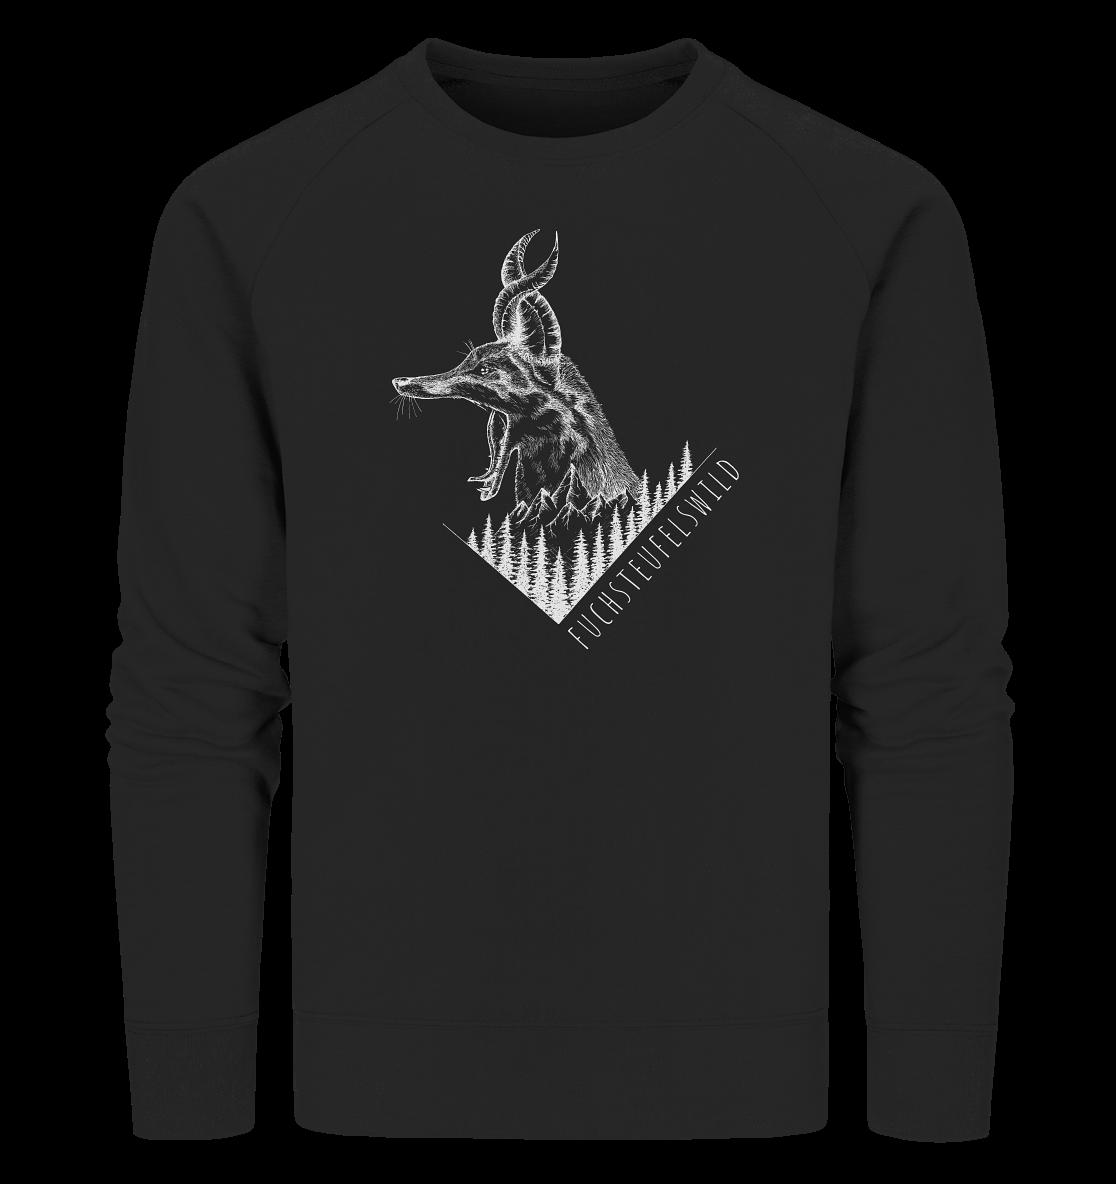 front-organic-sweatshirt-272727-1116x-2.png